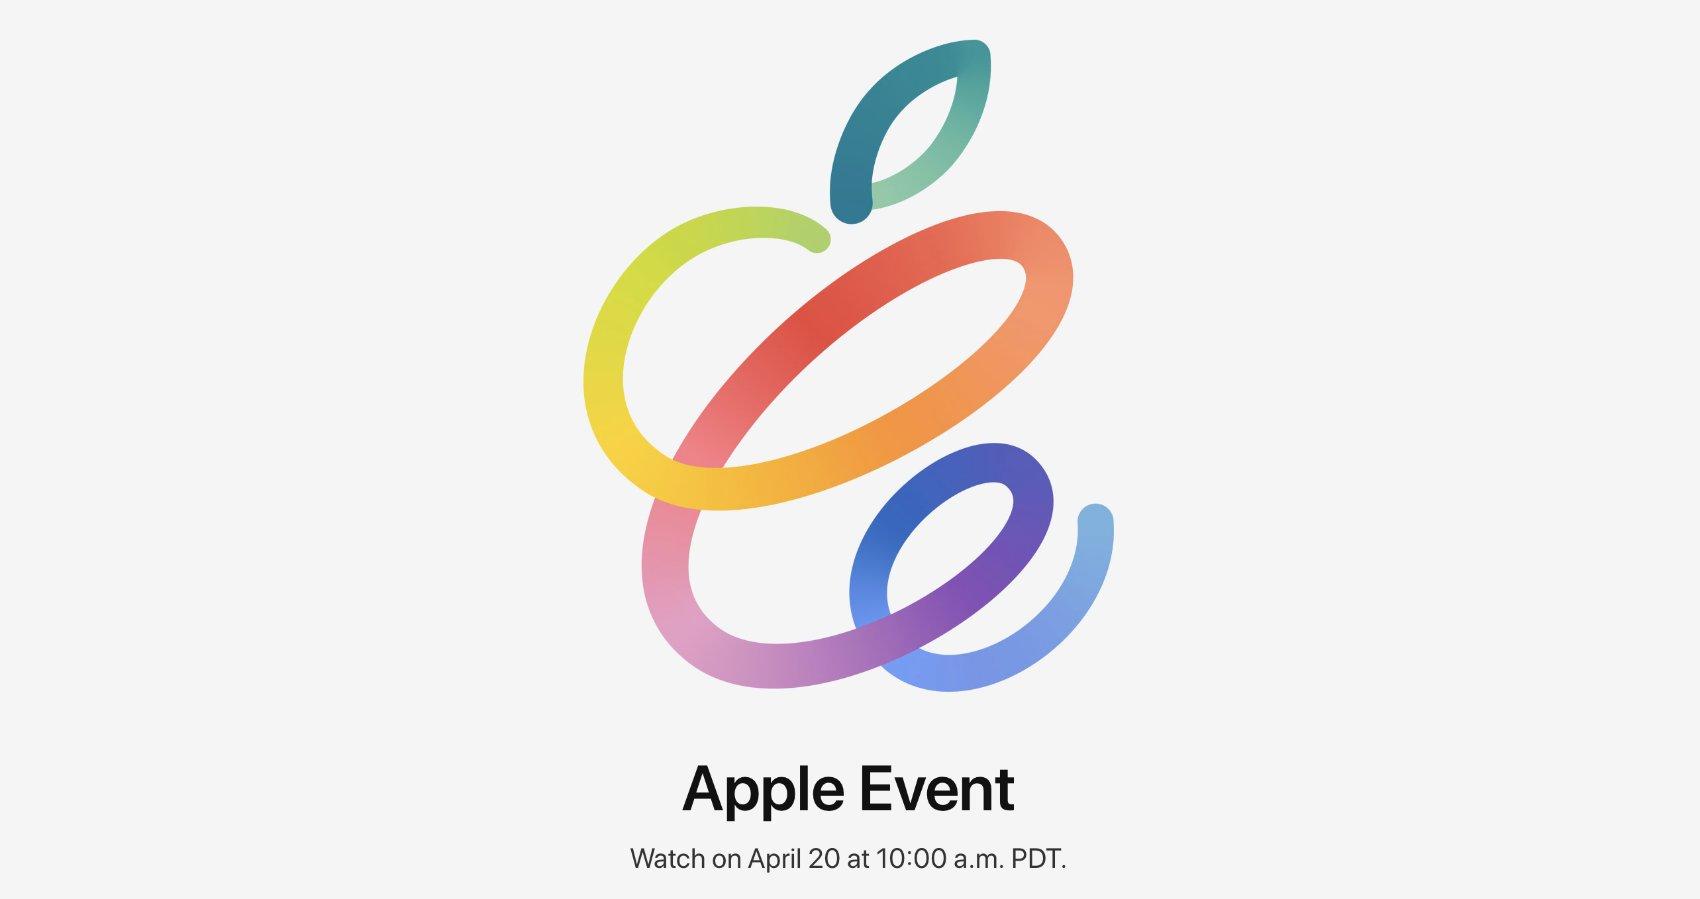 Apple Event April 20